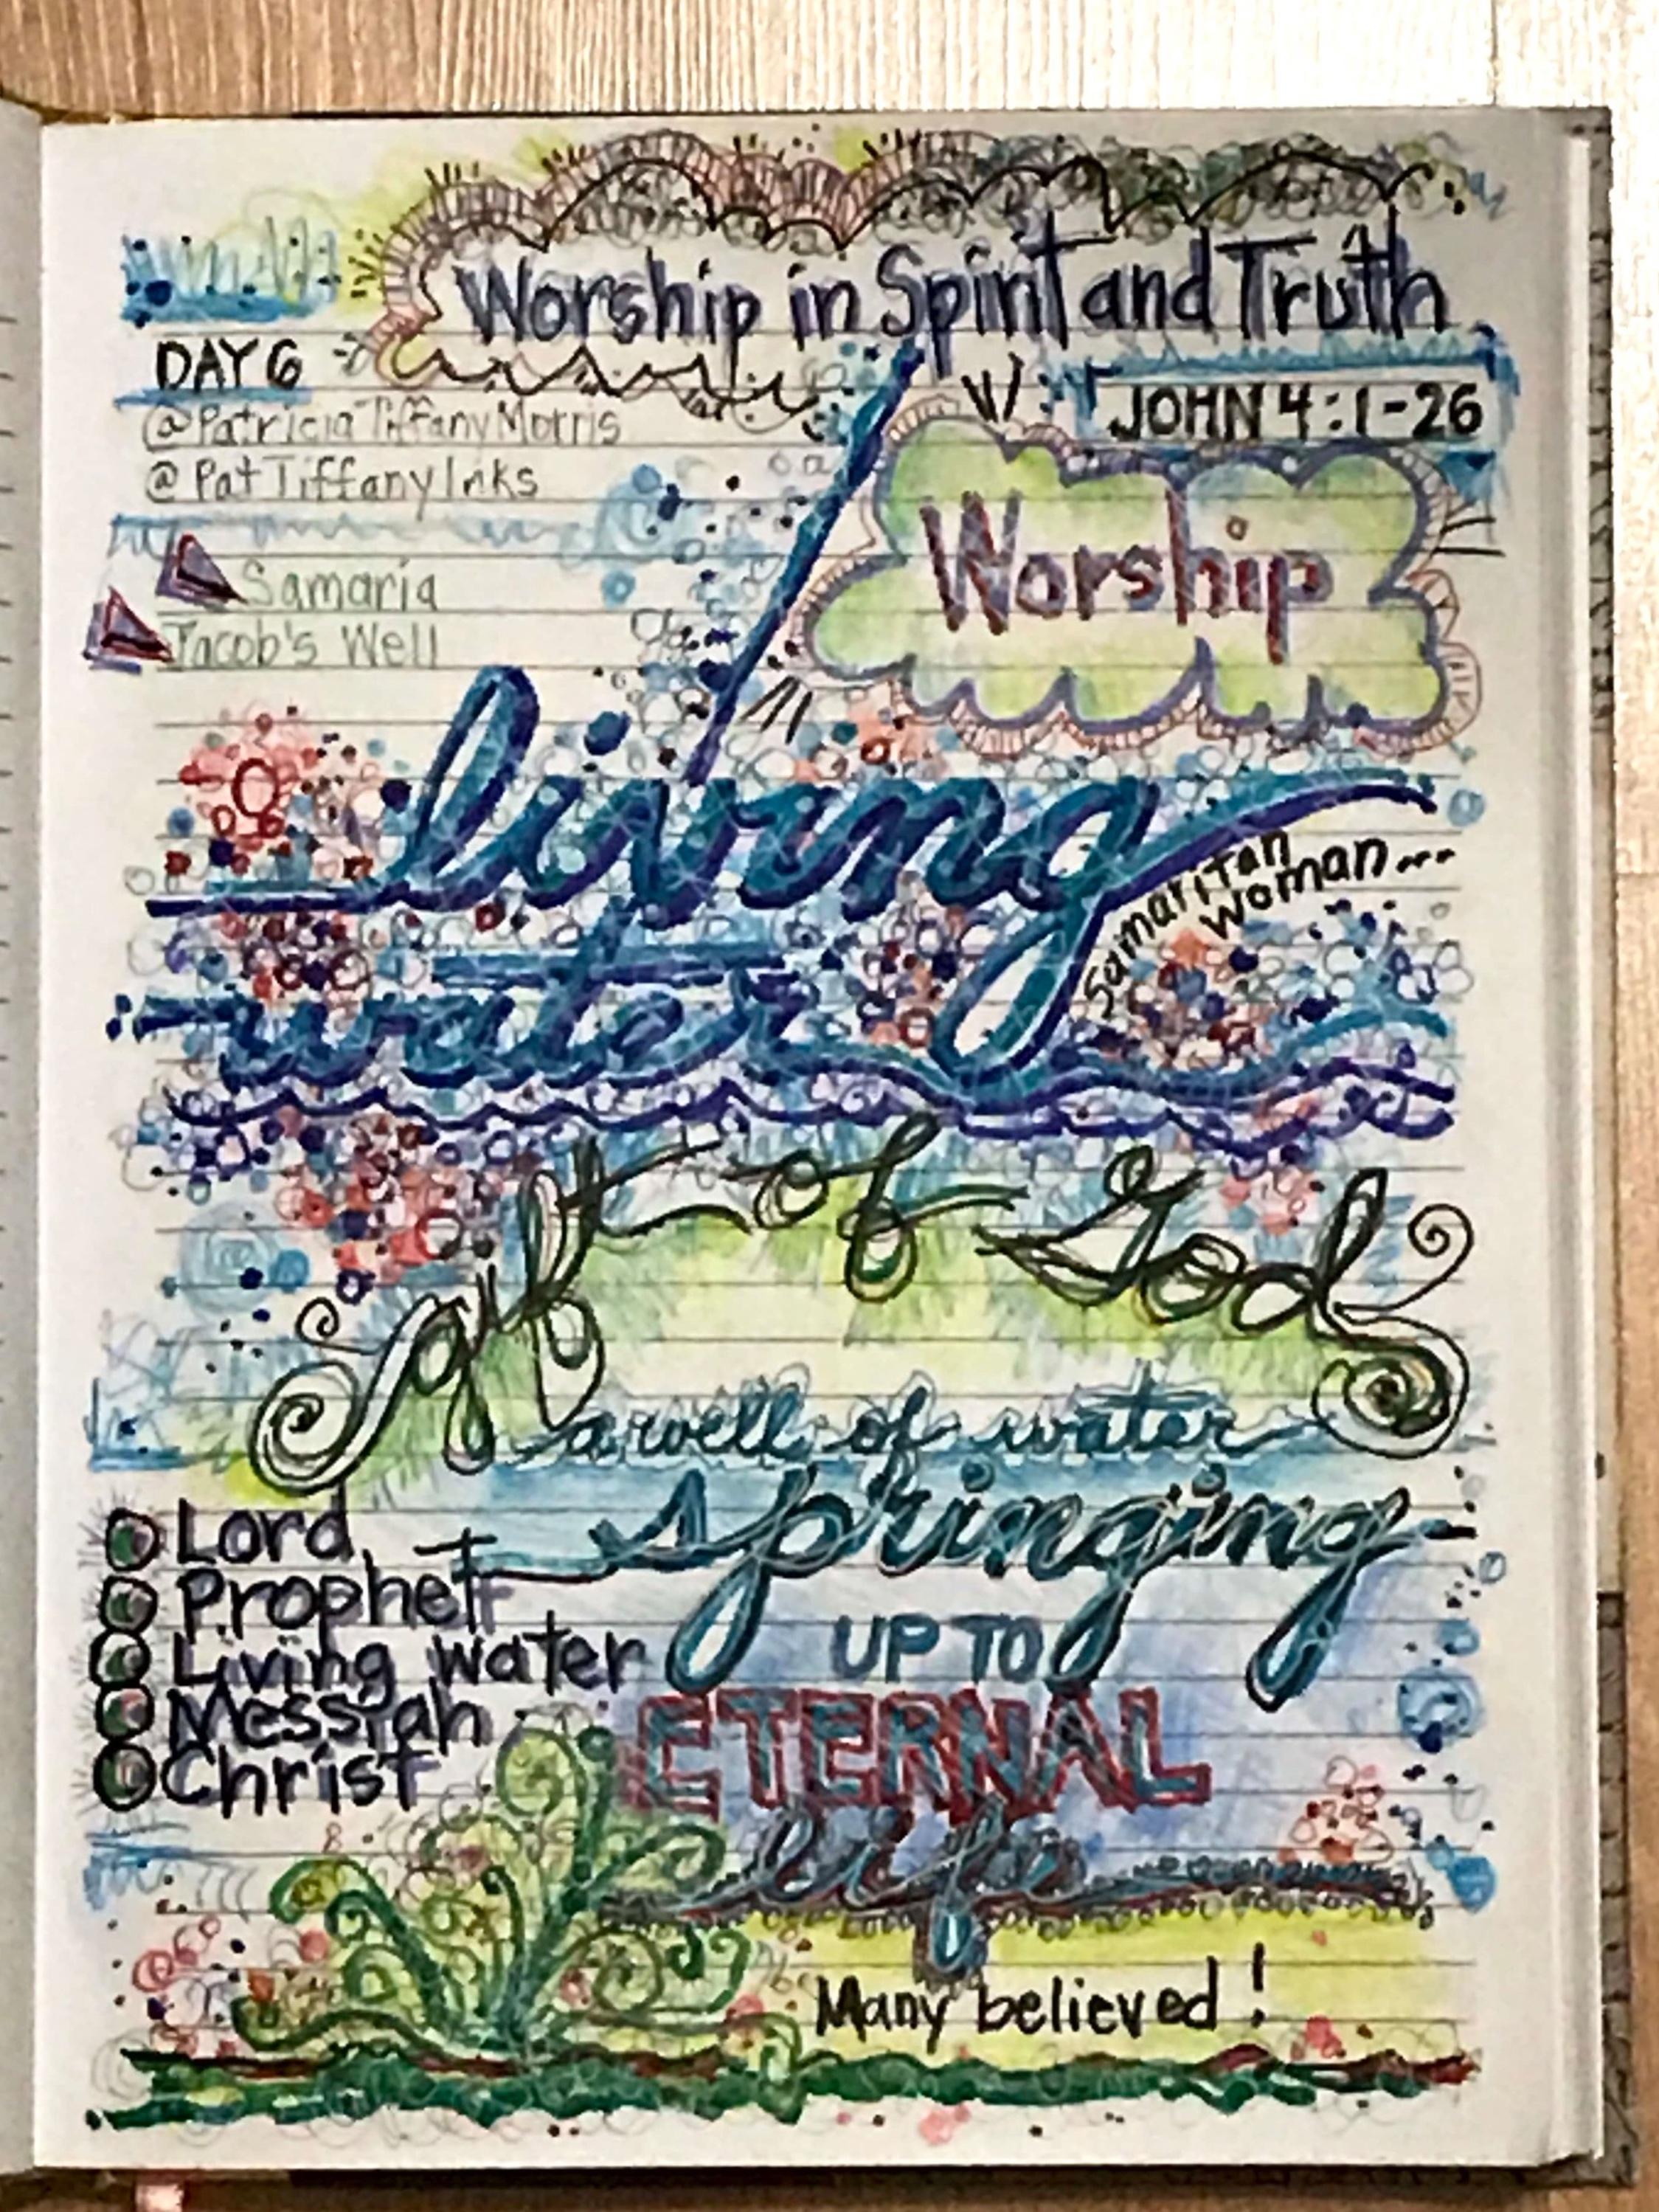 #gospelofjohn #jesusjournaljunkies #instauplift🙏#christianinspiration #precepts #biblestudy #sonofman #lambofgod